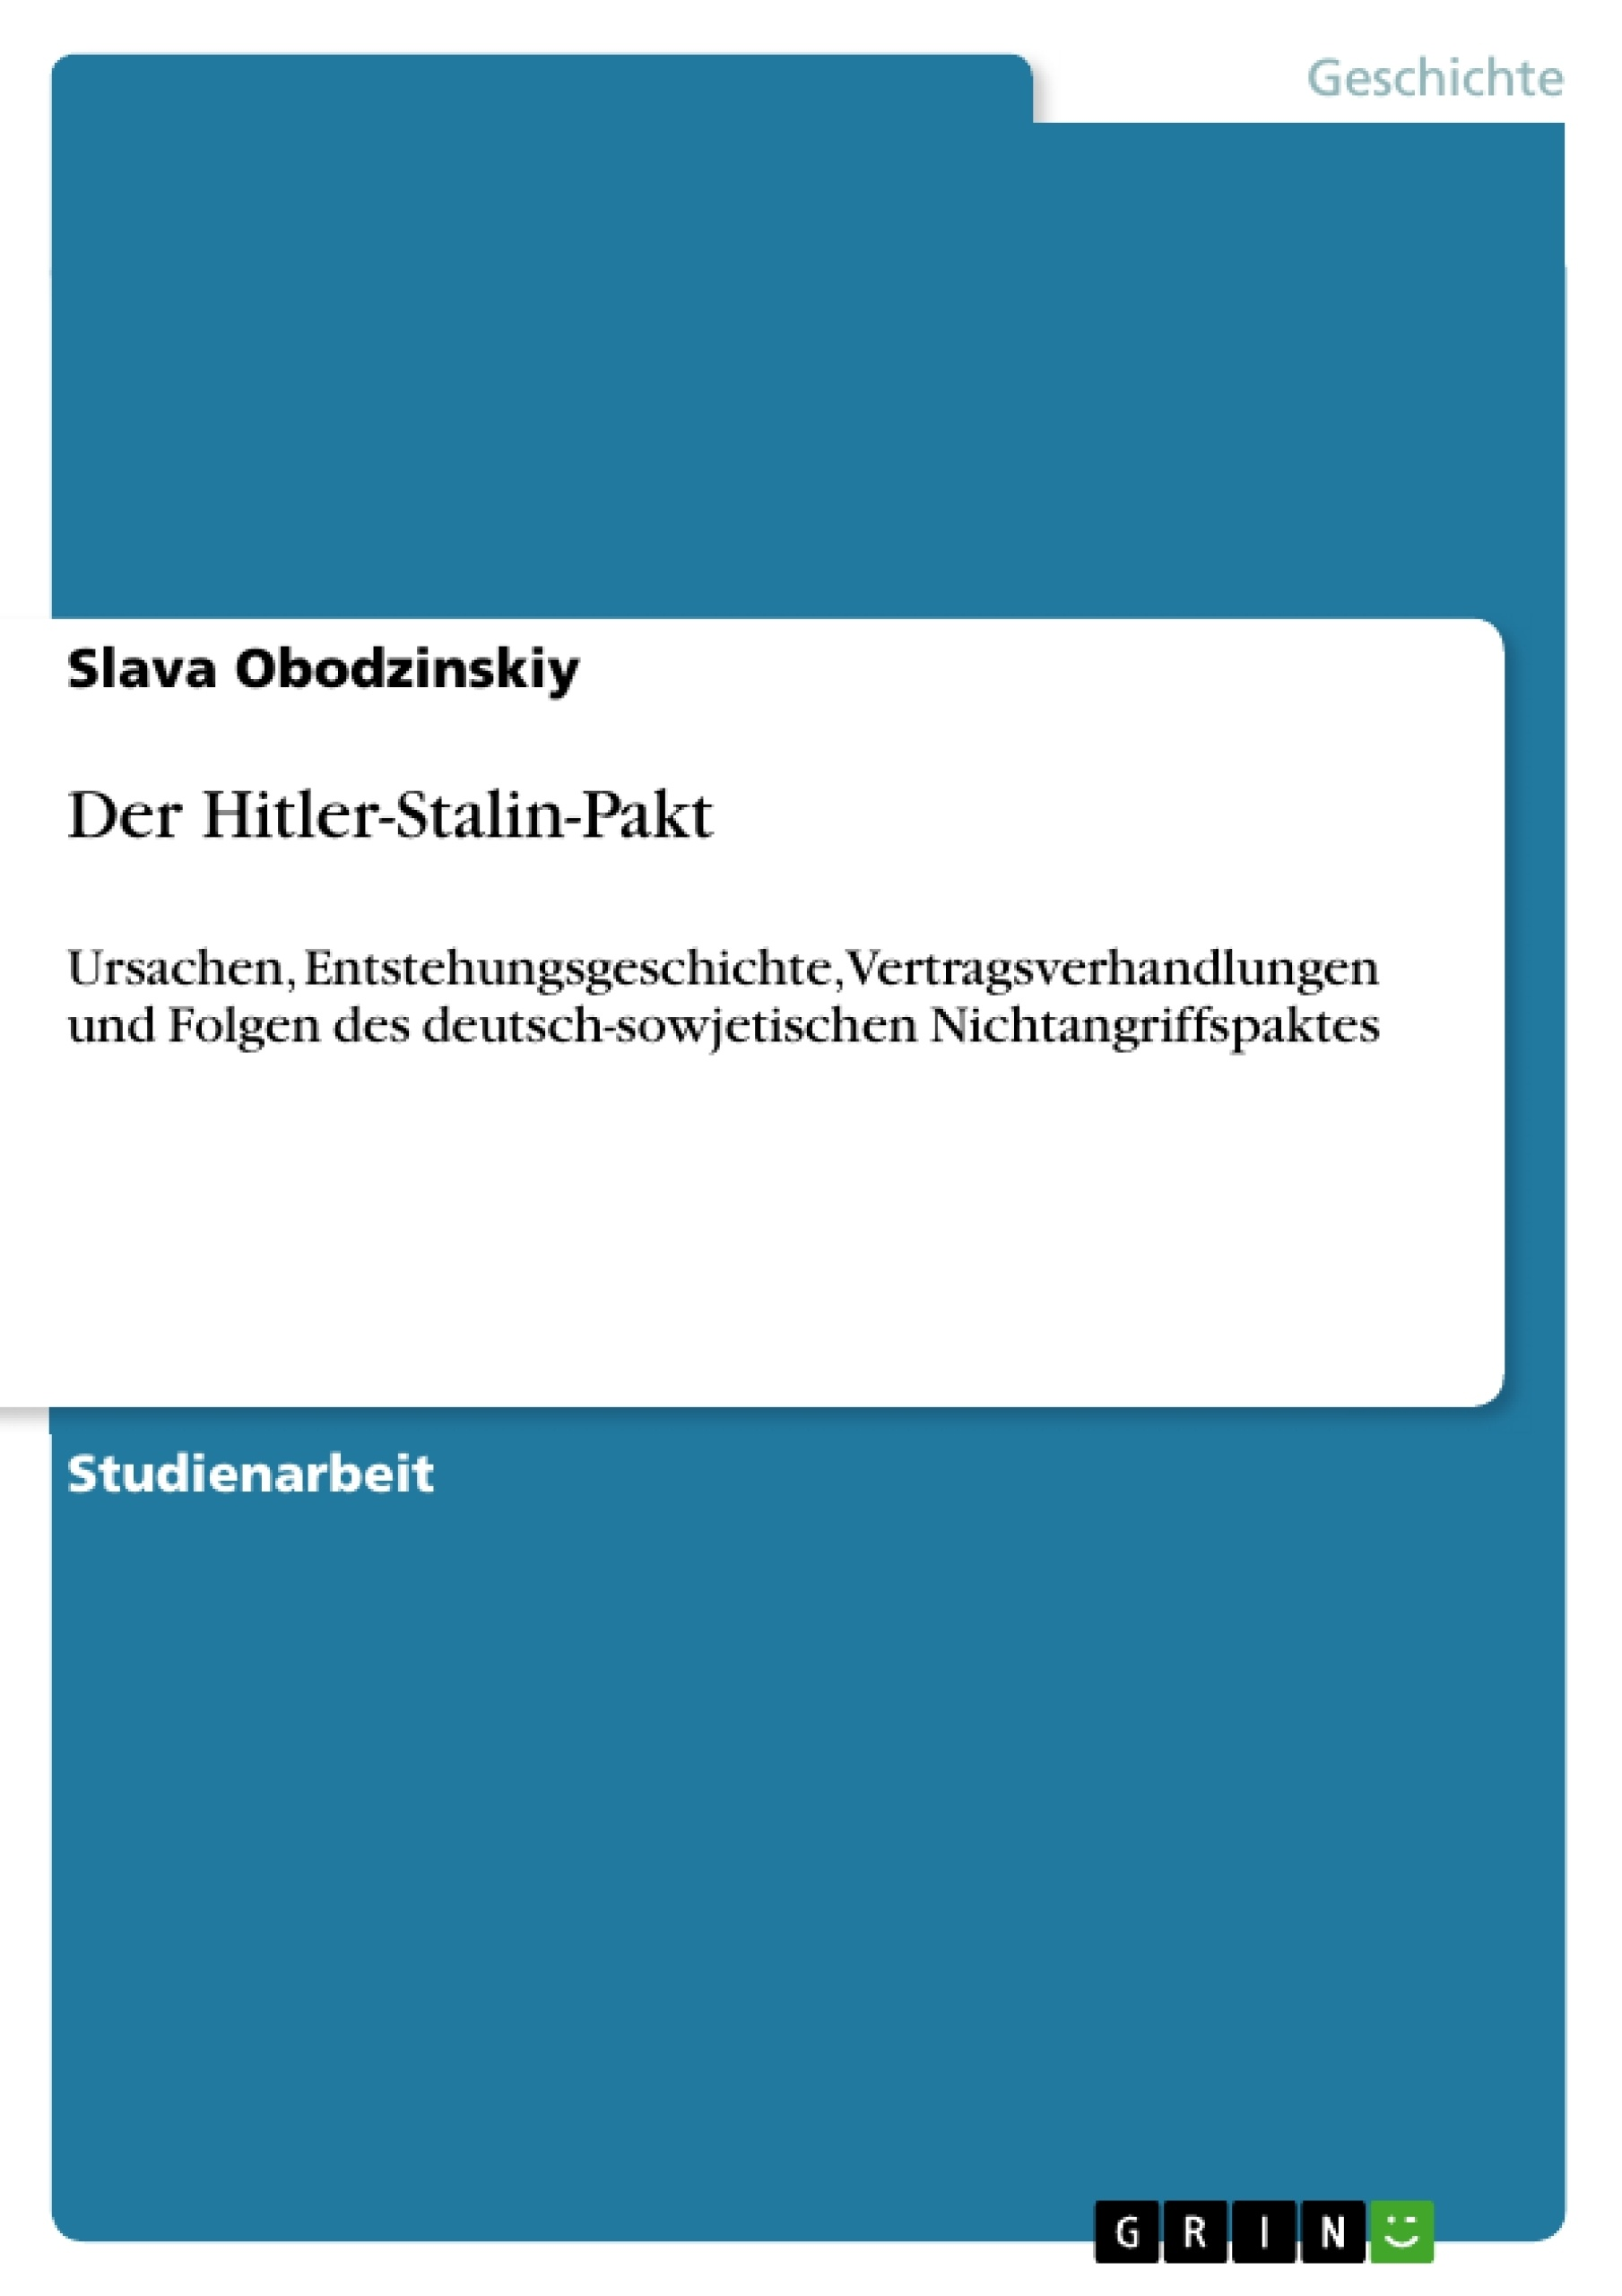 Titel: Der Hitler-Stalin-Pakt